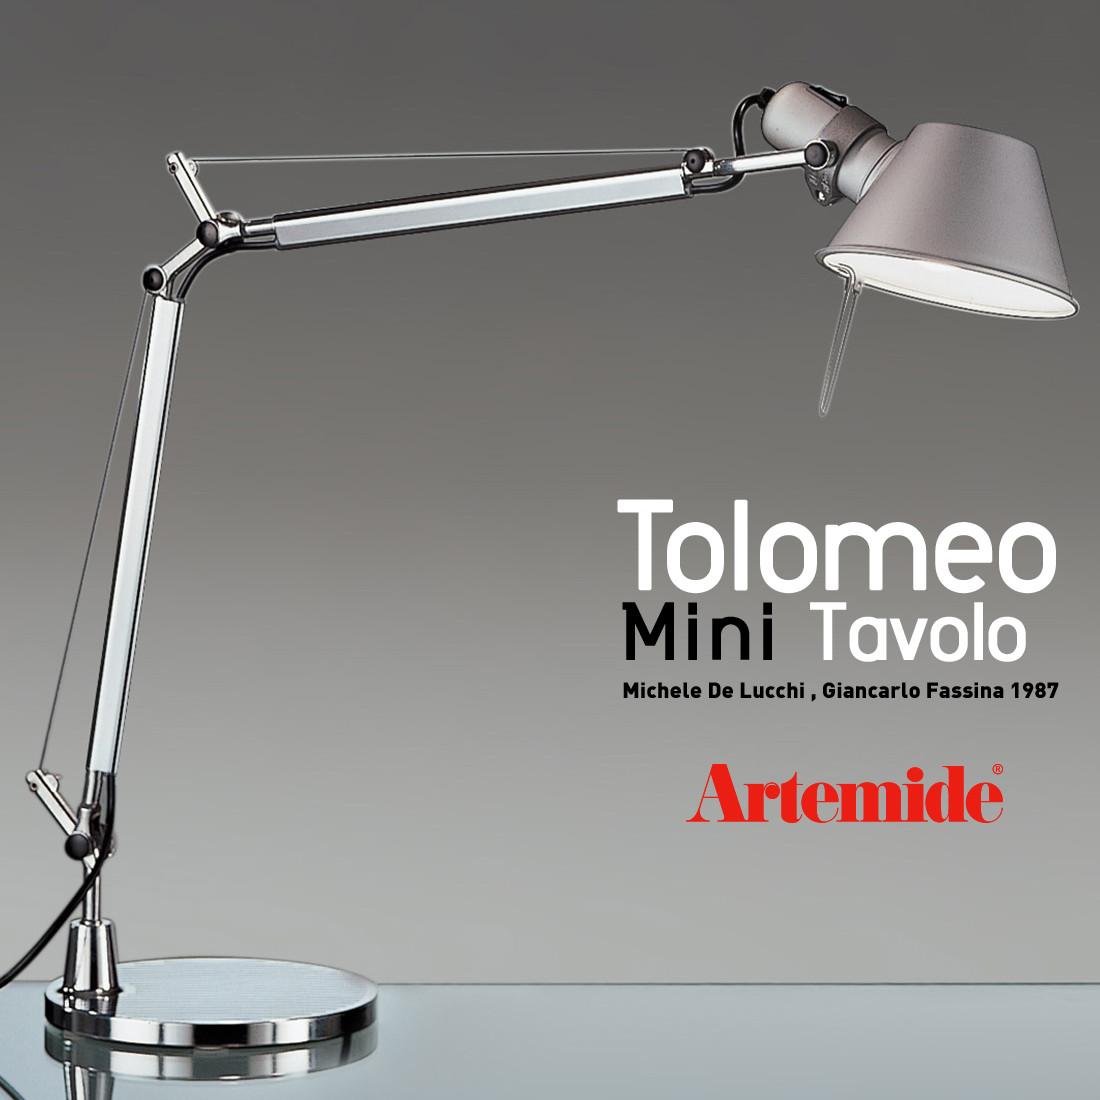 【Artemide アルテミデ】TOLOMEO MINI TABLE トロメオ テーブルランプ 電球仕様ライト 照明 リビング キッチン スタンド 寝室 テーブルライト